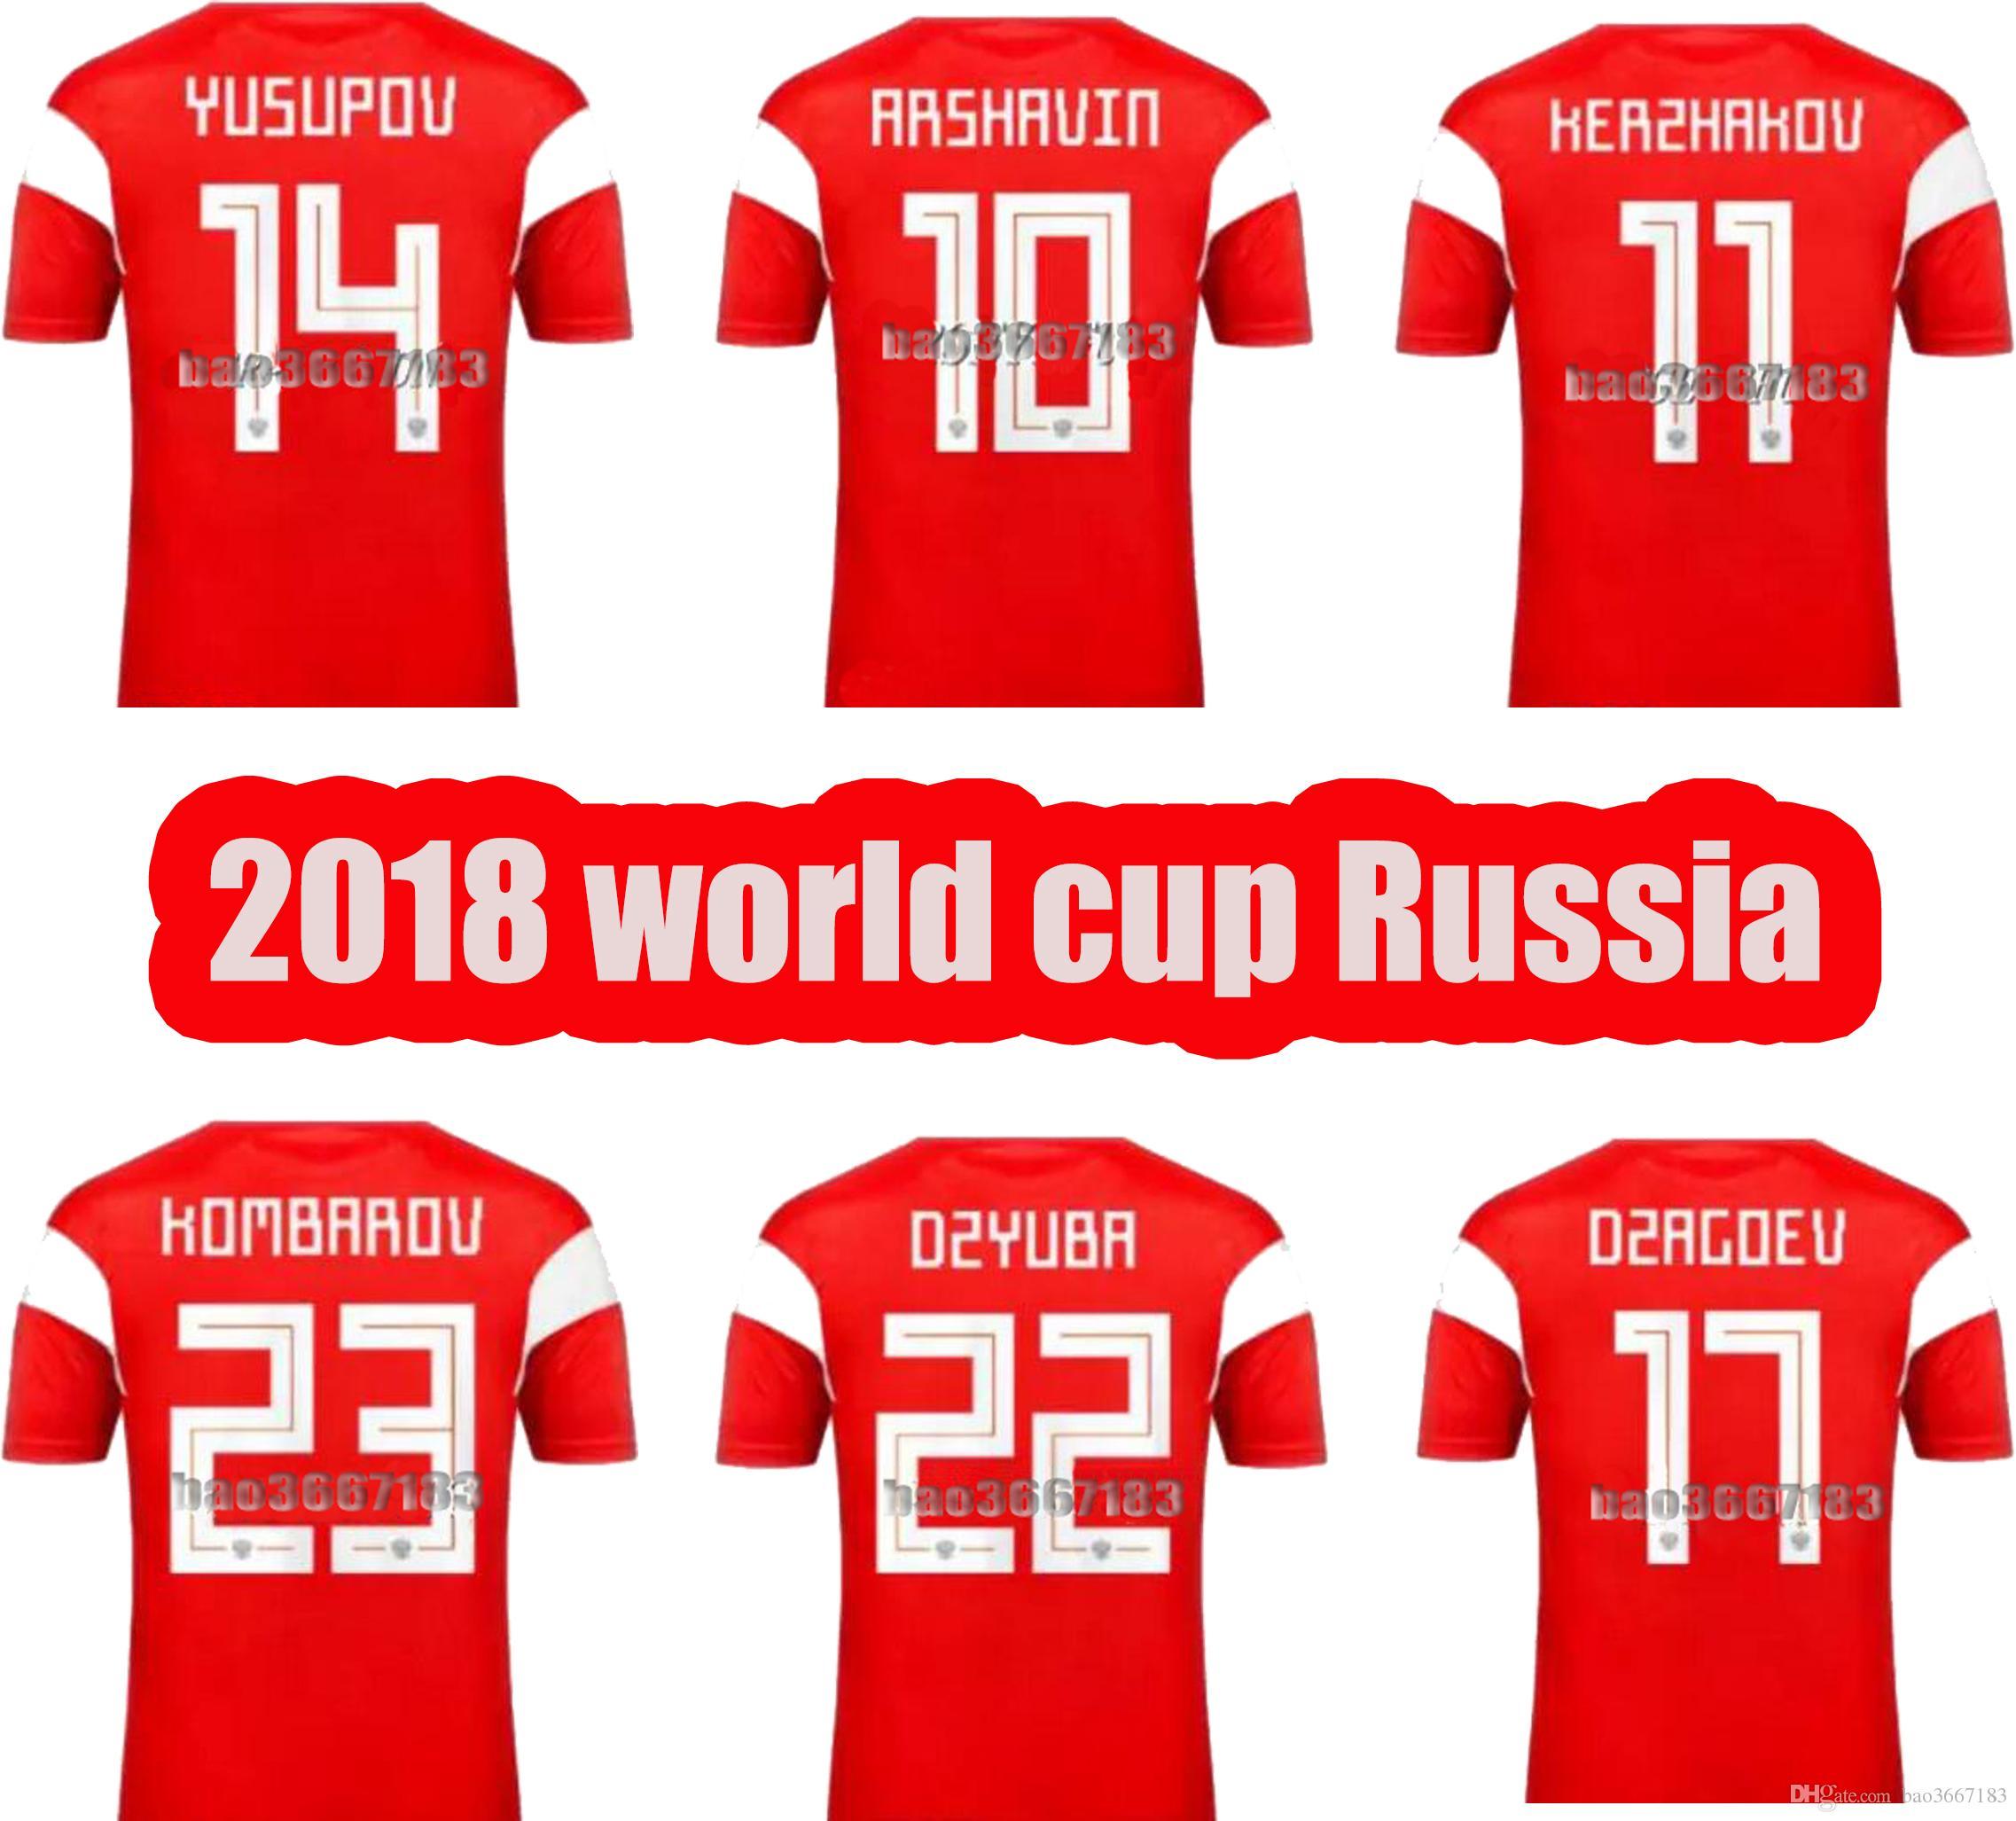 6b060fa75 2019 Thai Quality 2018 World Cup Russia Soccer Jerseys 2018 World Cup  Russian Home Red Football Uniform Kokorin Dzyuba Smolov Soccer Shirts From  Bao3667183